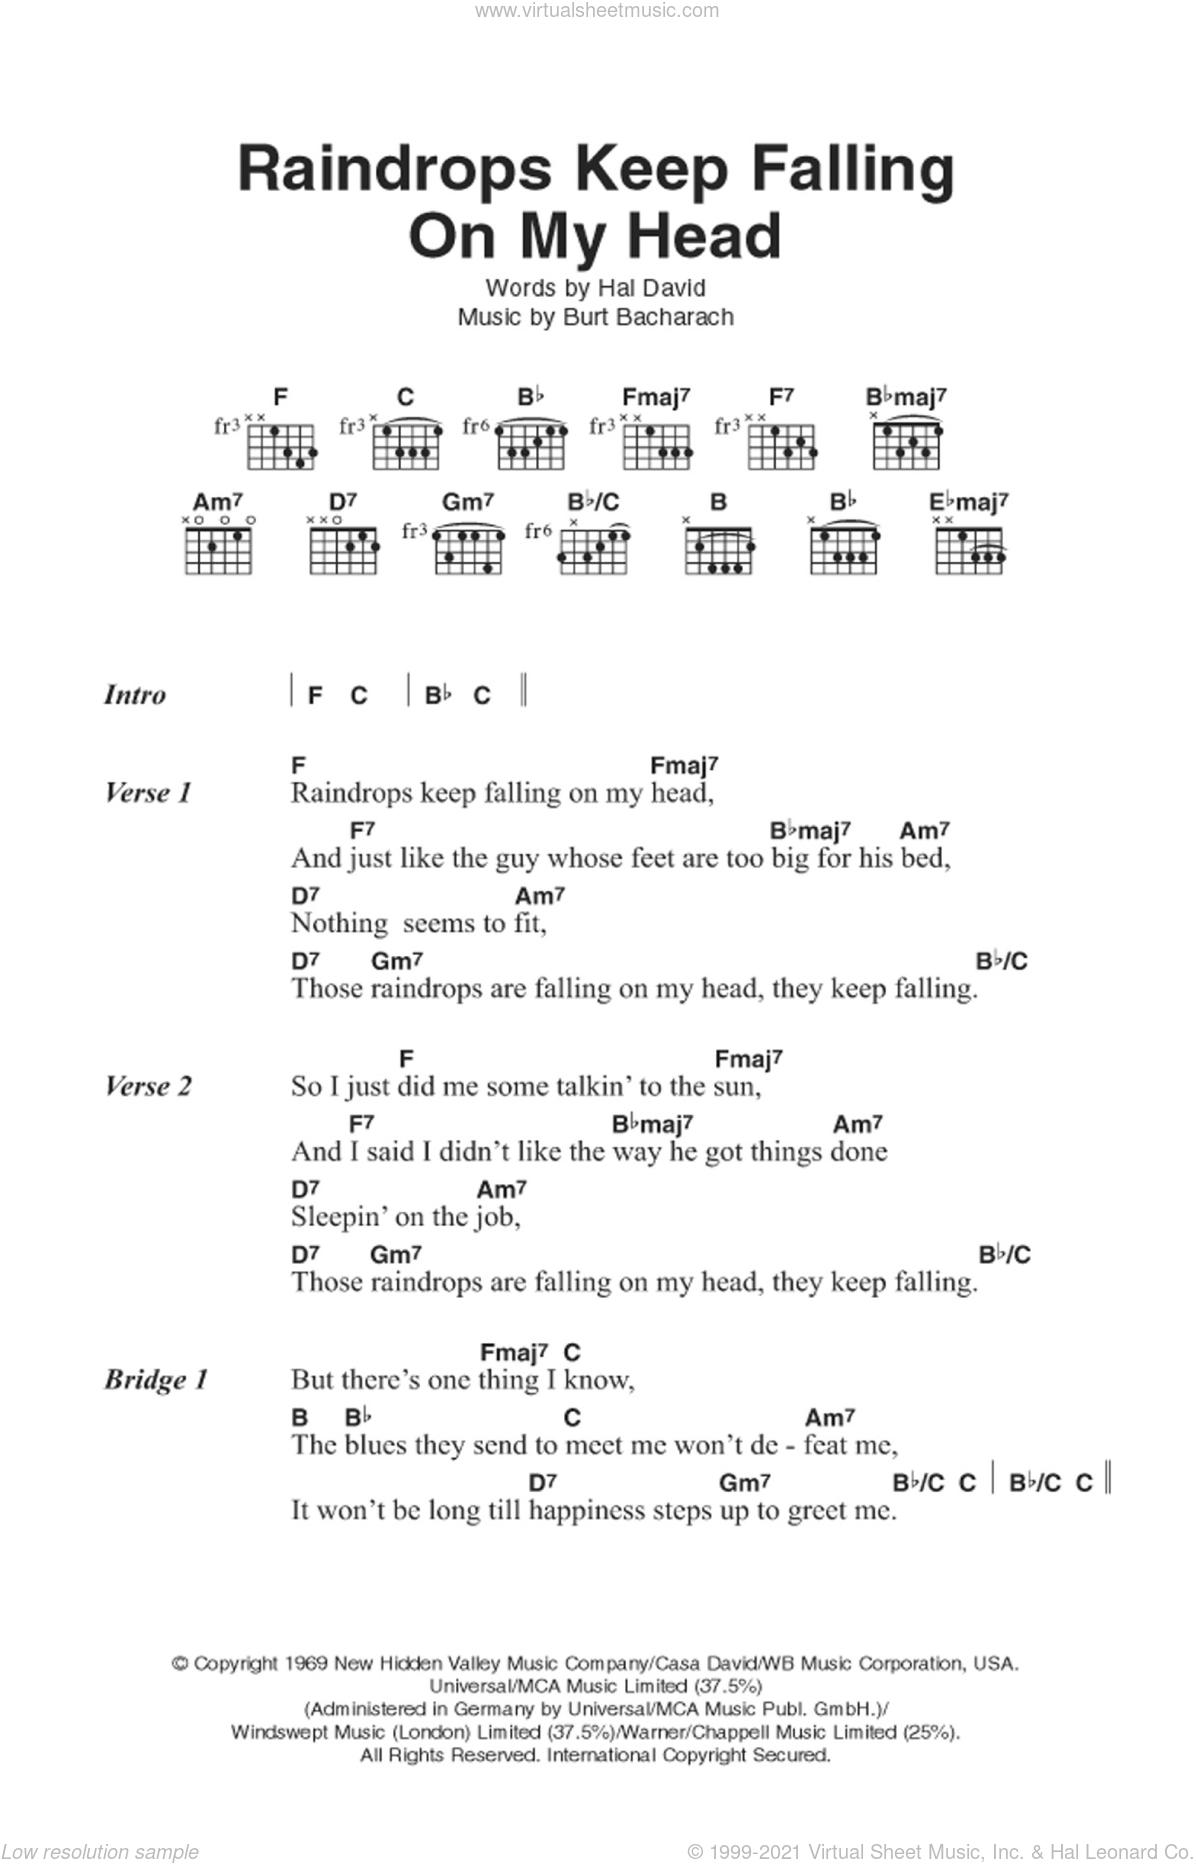 Raindrops Keep Falling On My Head sheet music for guitar (chords) by Burt Bacharach, Bacharach & David and Hal David, intermediate skill level